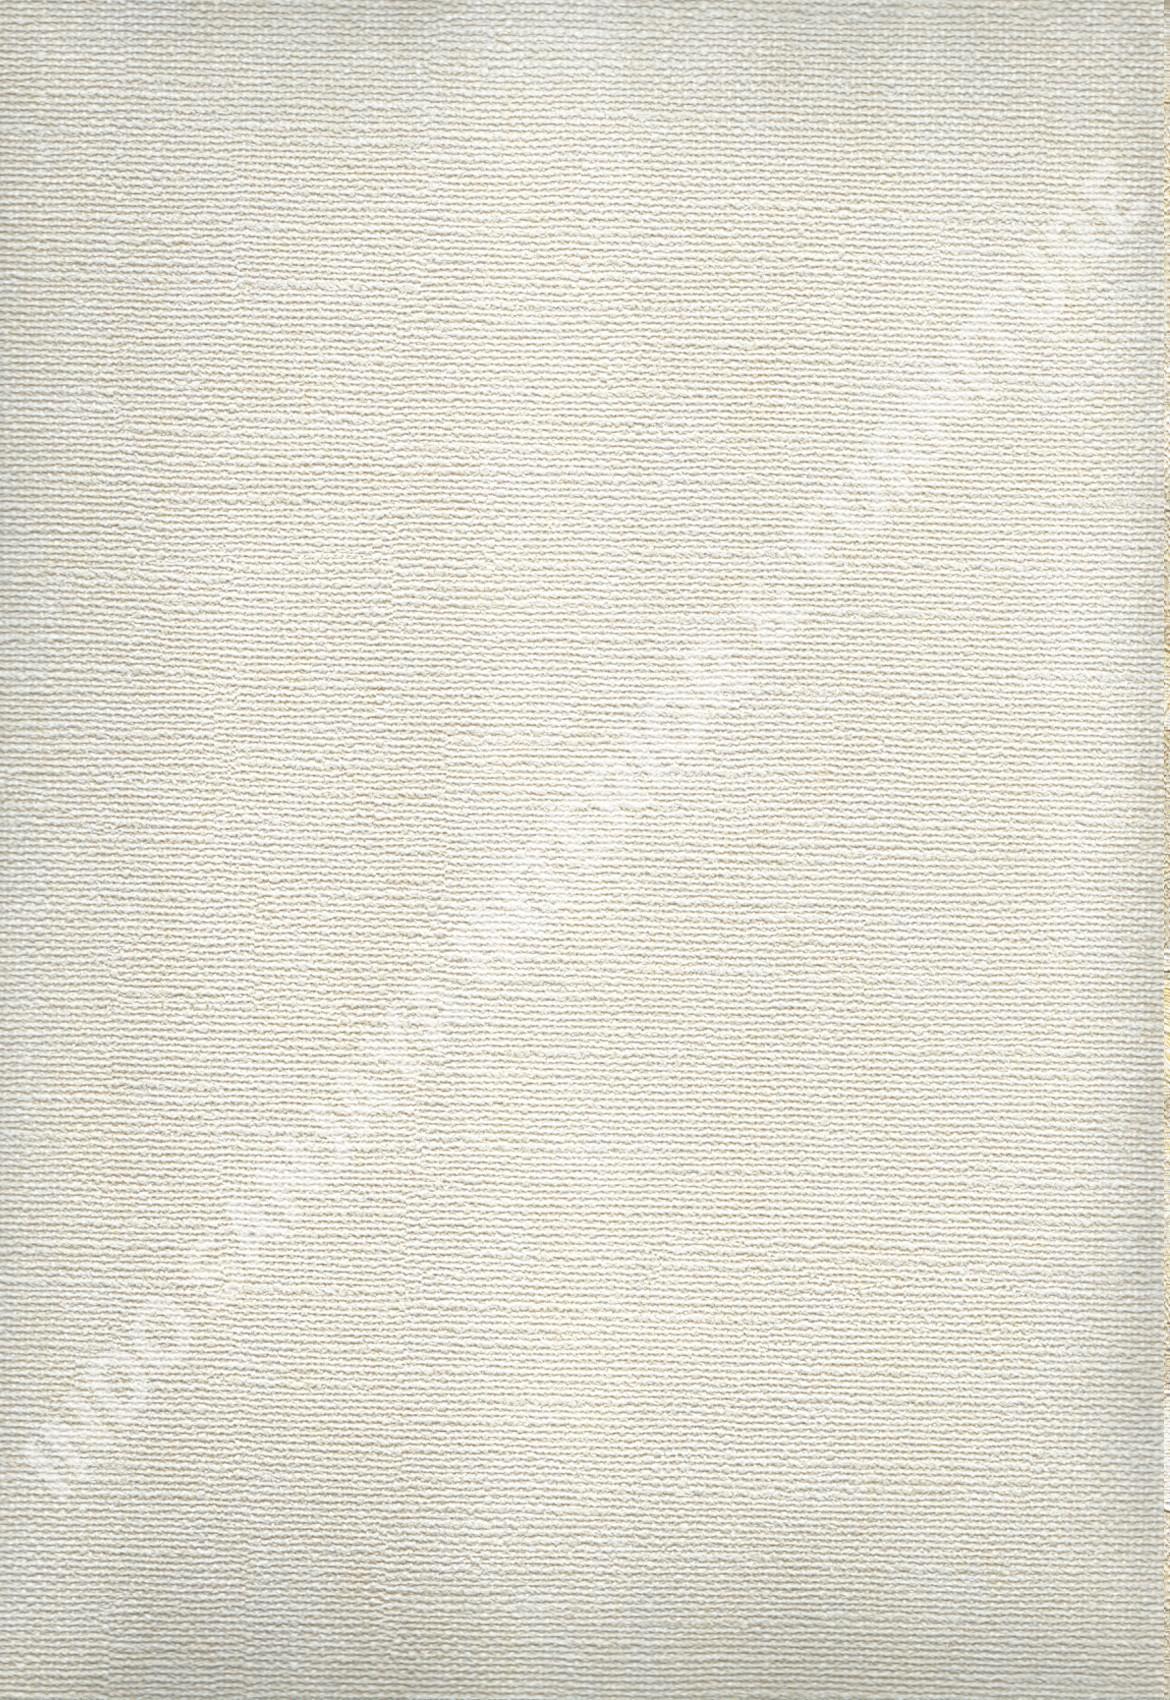 wallpaper   Wallpaper Minimalis Polos DL13203:DL13203 corak  warna